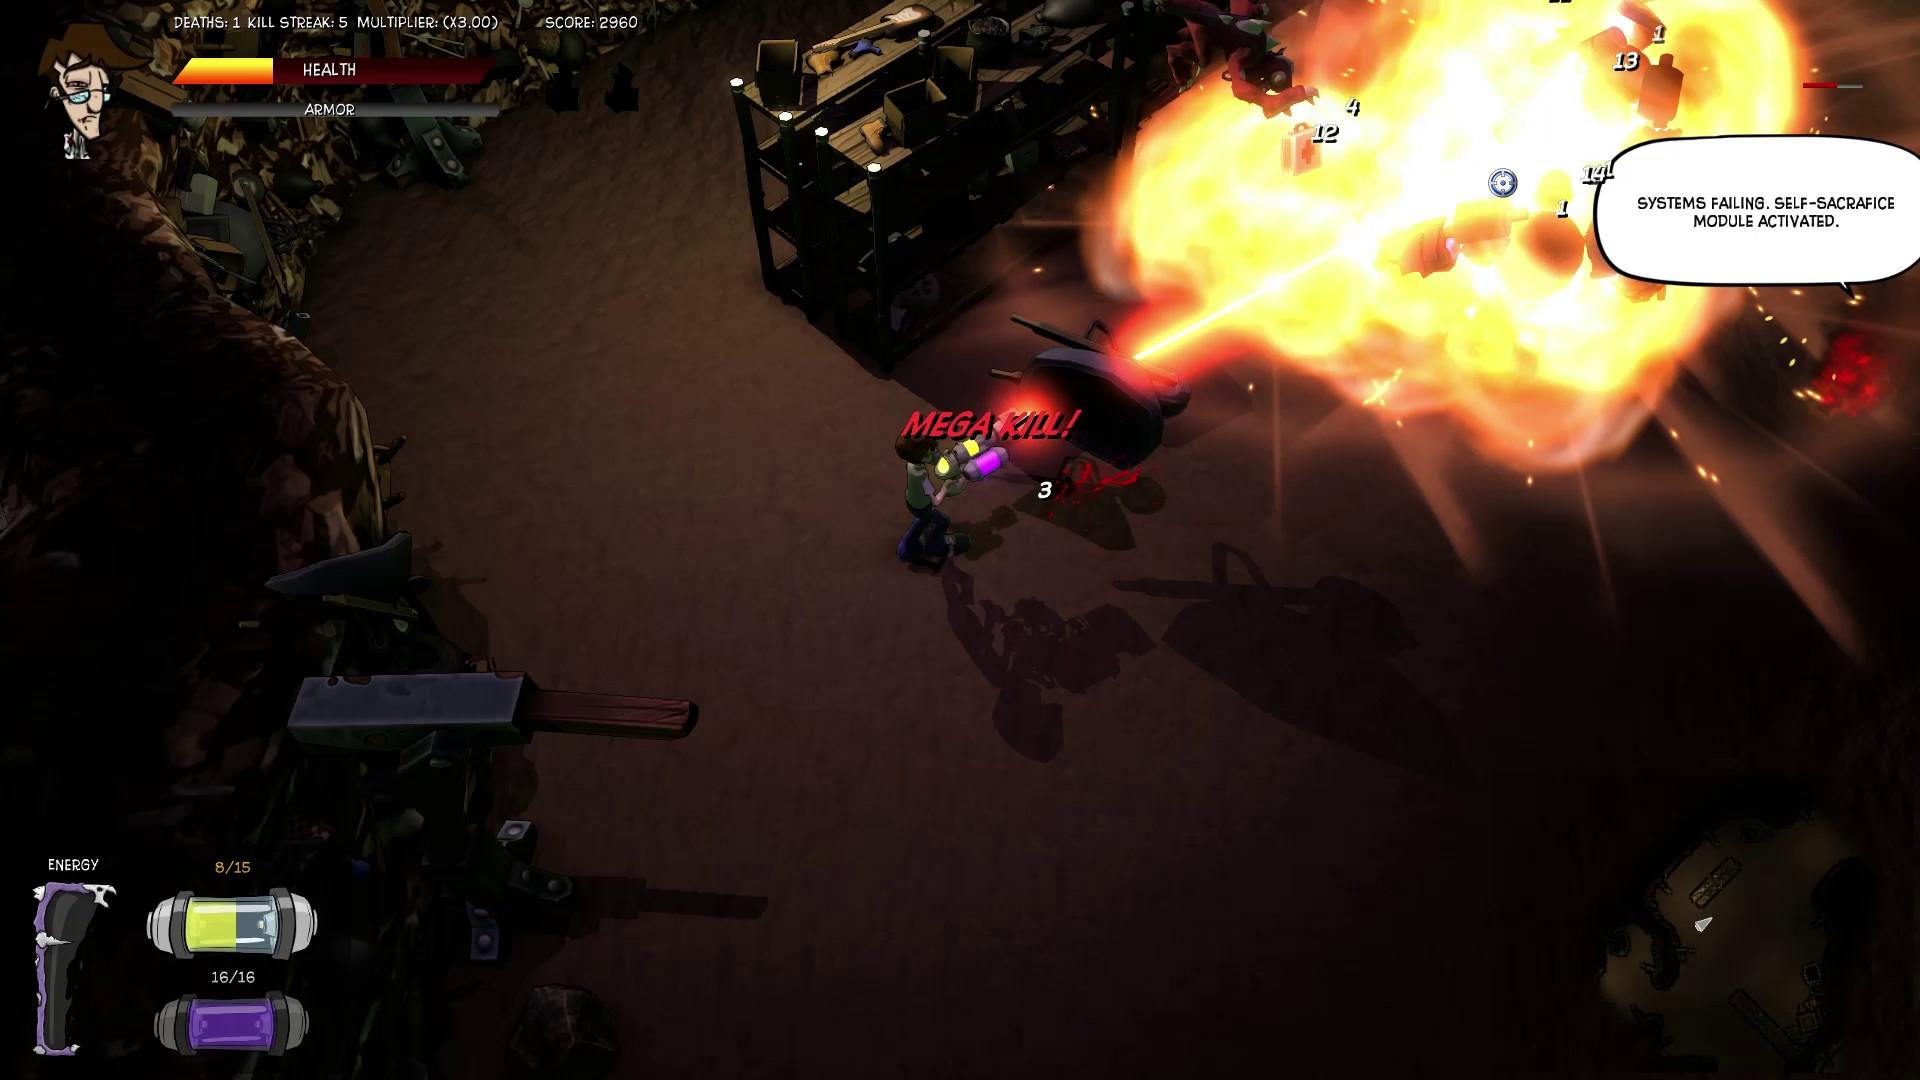 Tom vs. The Armies of Hell Screenshot 1